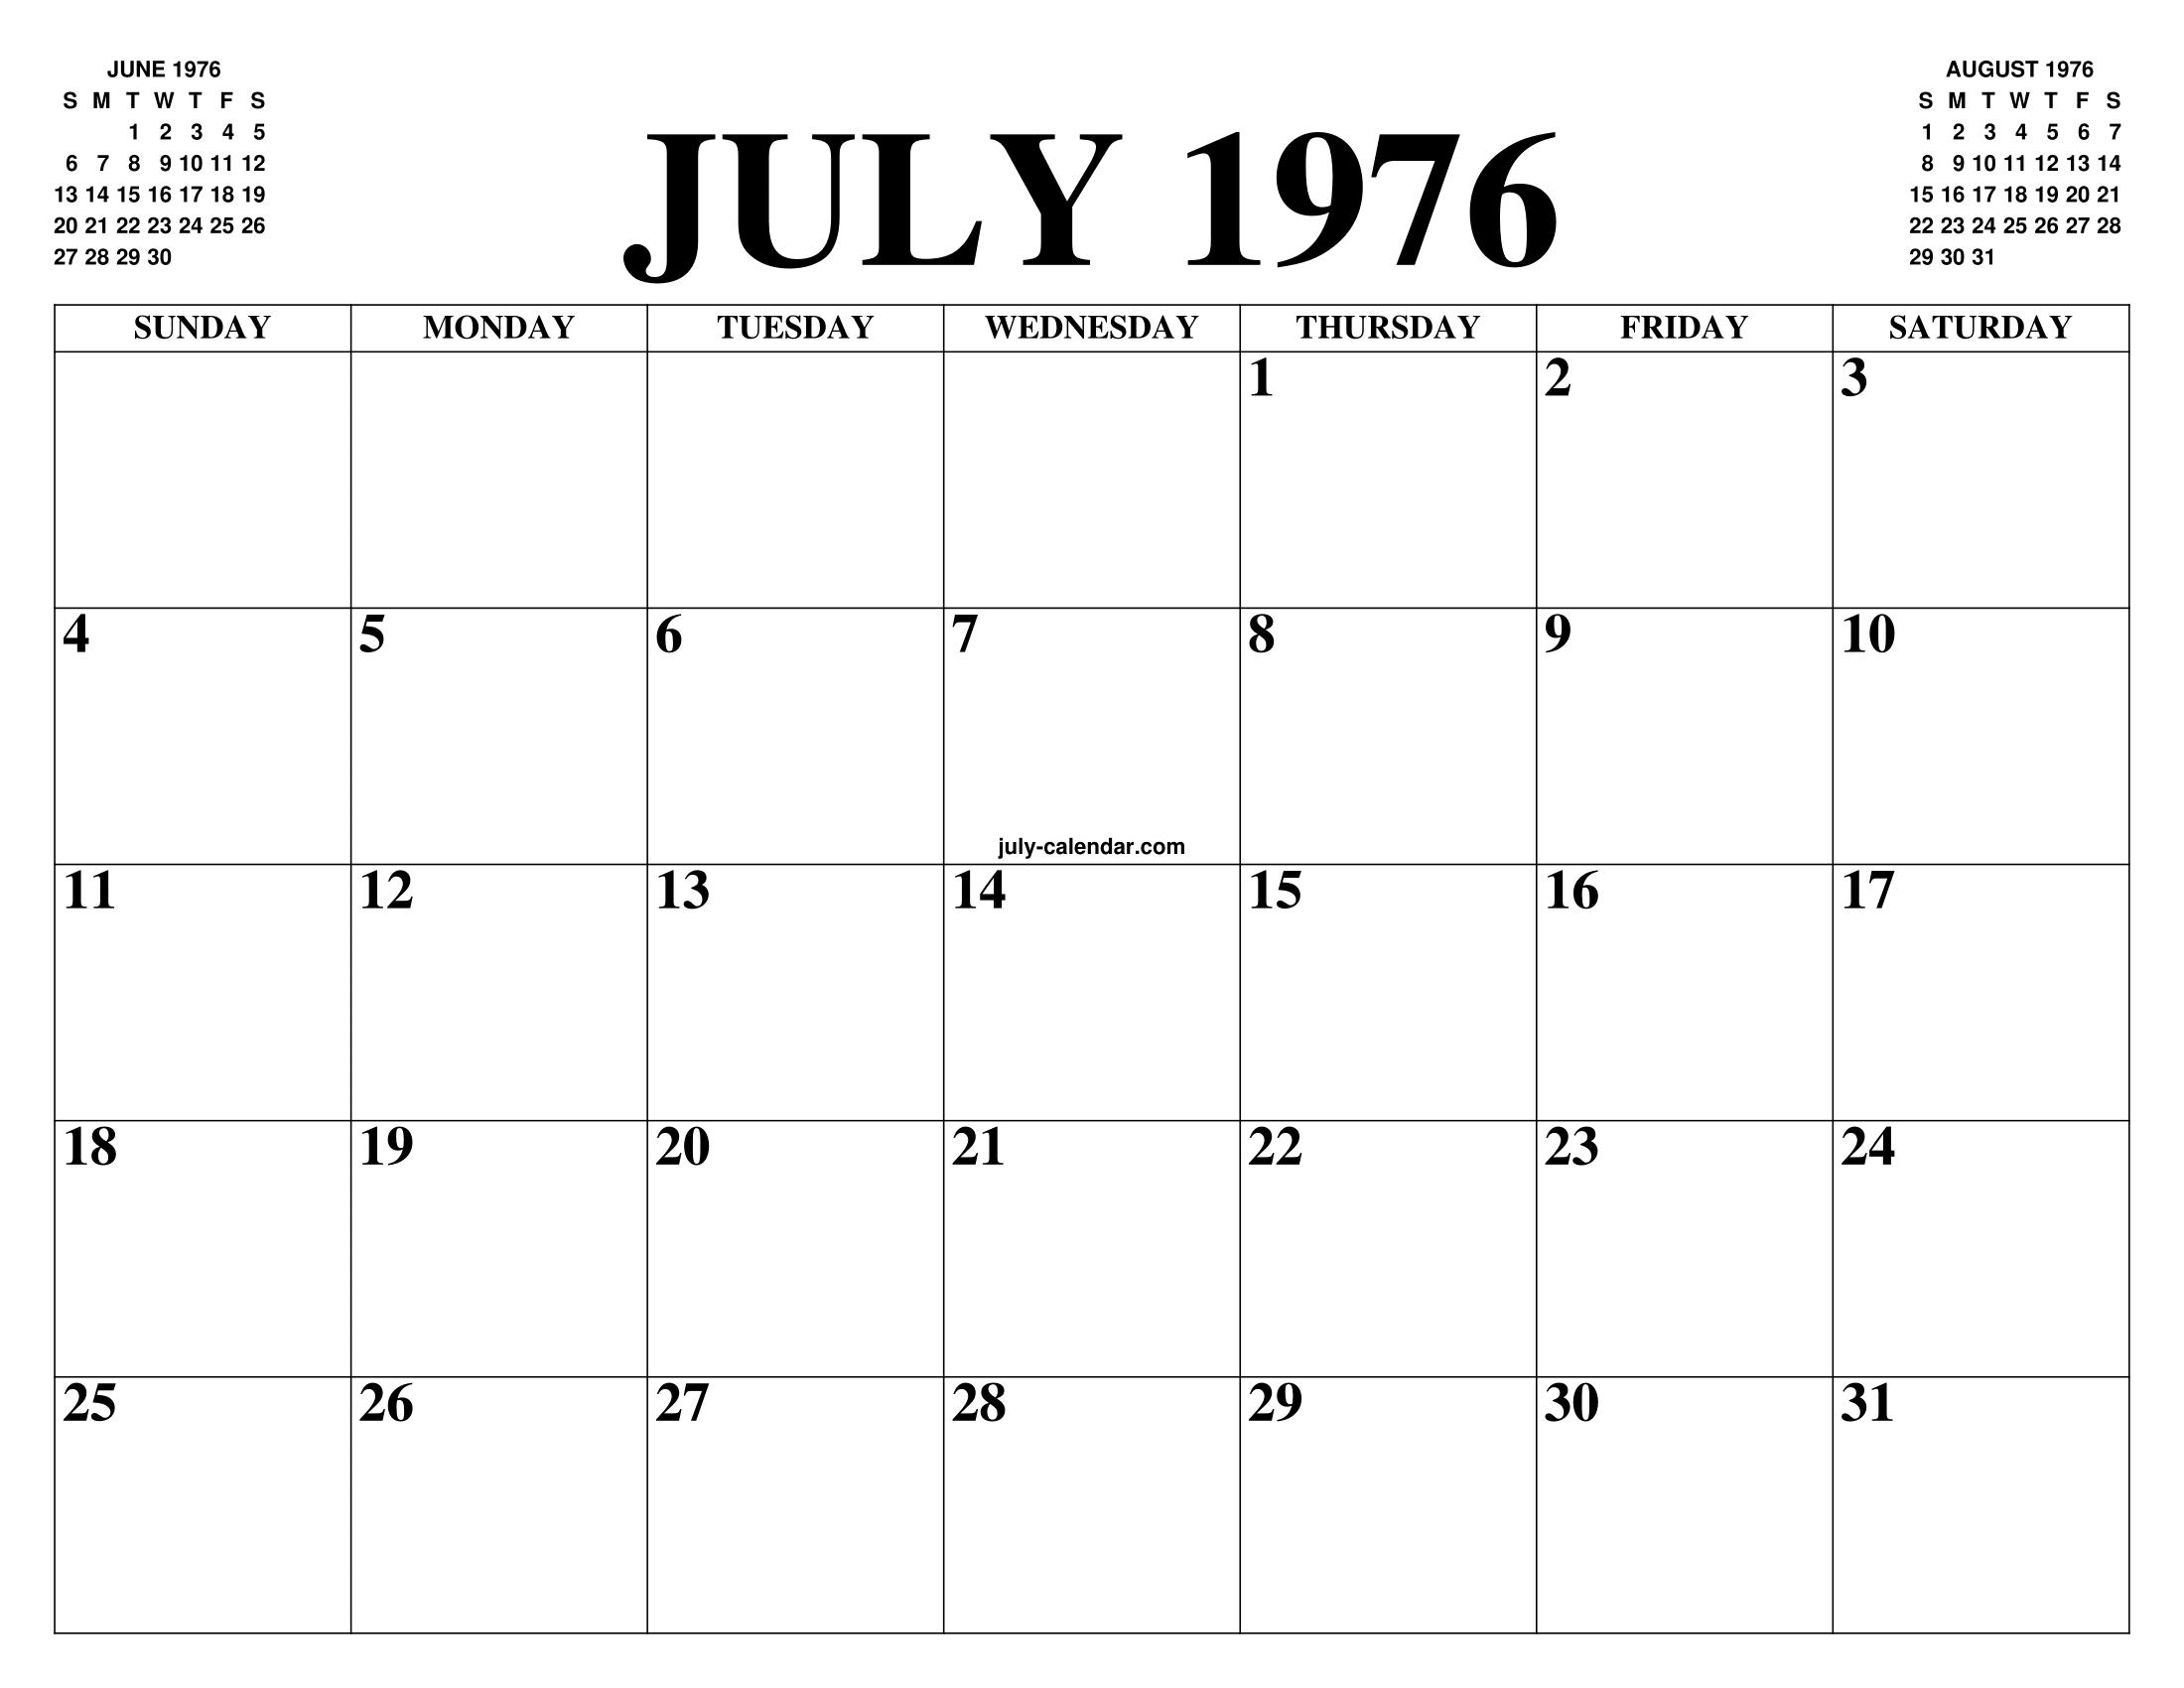 Calendario Julio 1976.July 1976 Calendar Of The Month Free Printable July